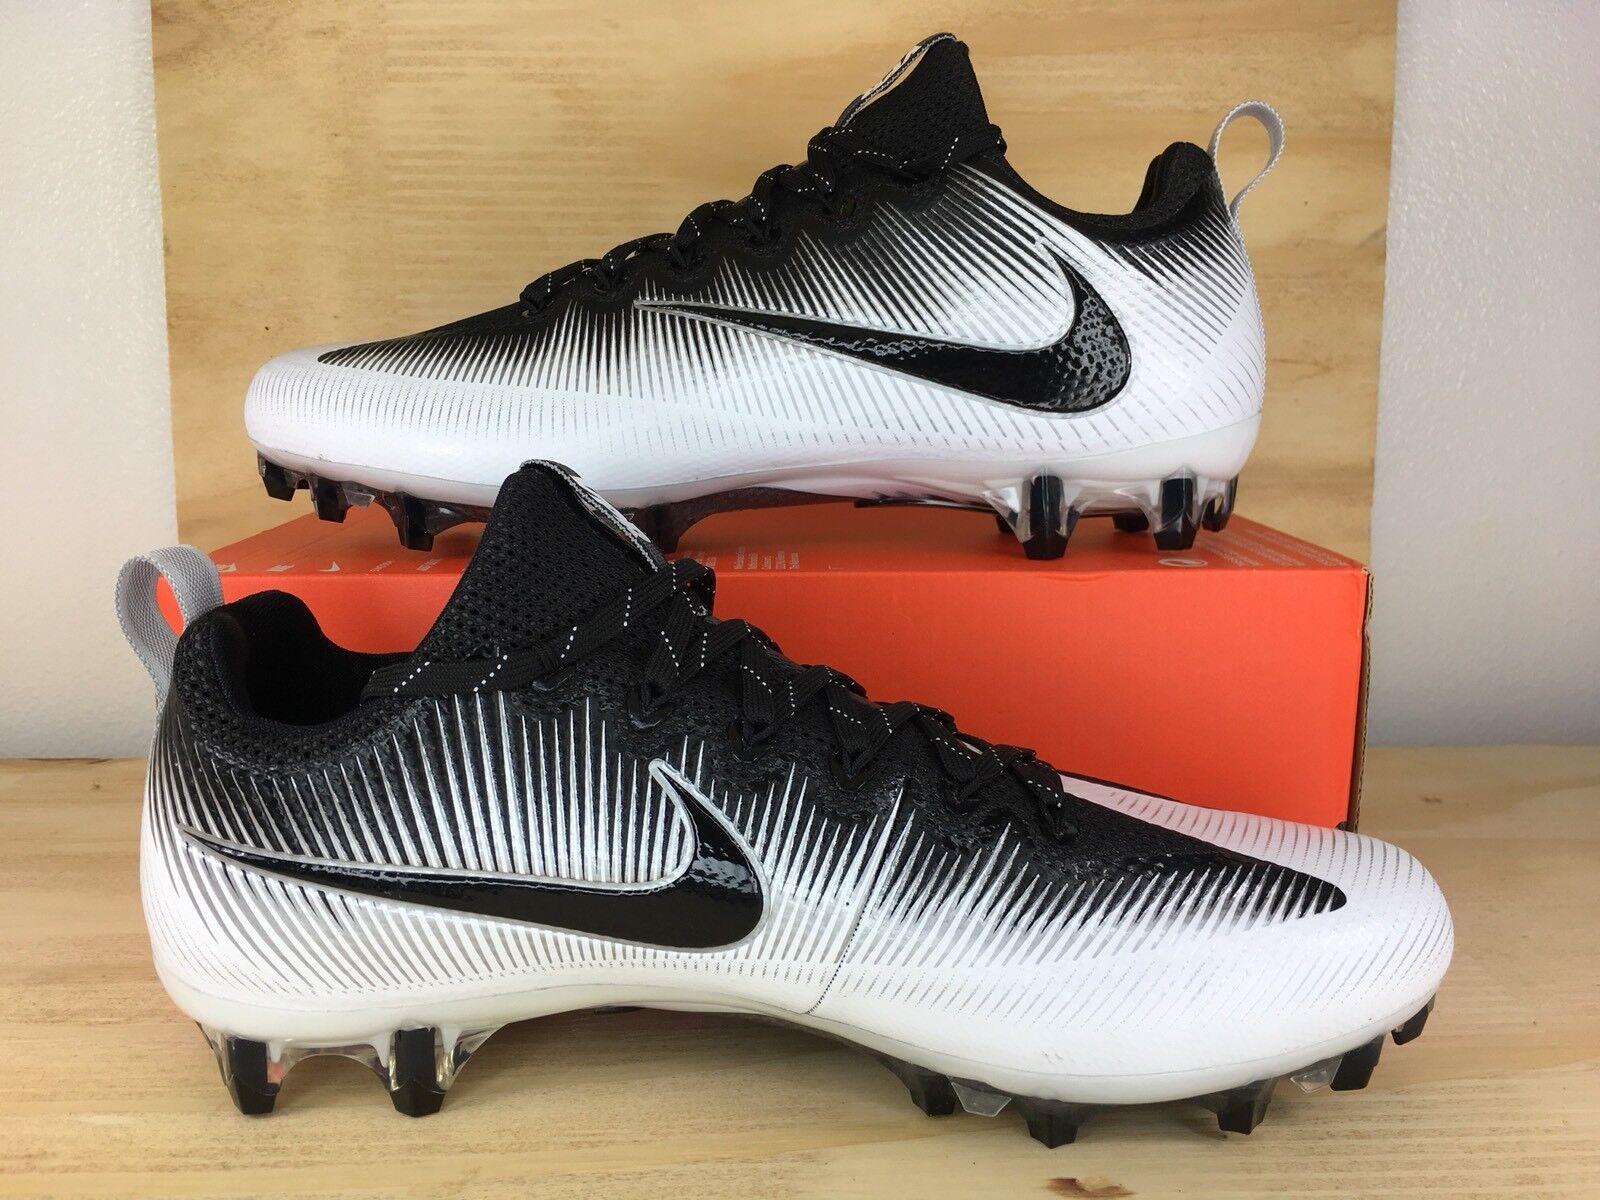 Nike Vapor Untouchable Pro Football Cleats White Black Oreo SIZE Price reduction Cheap women's shoes women's shoes